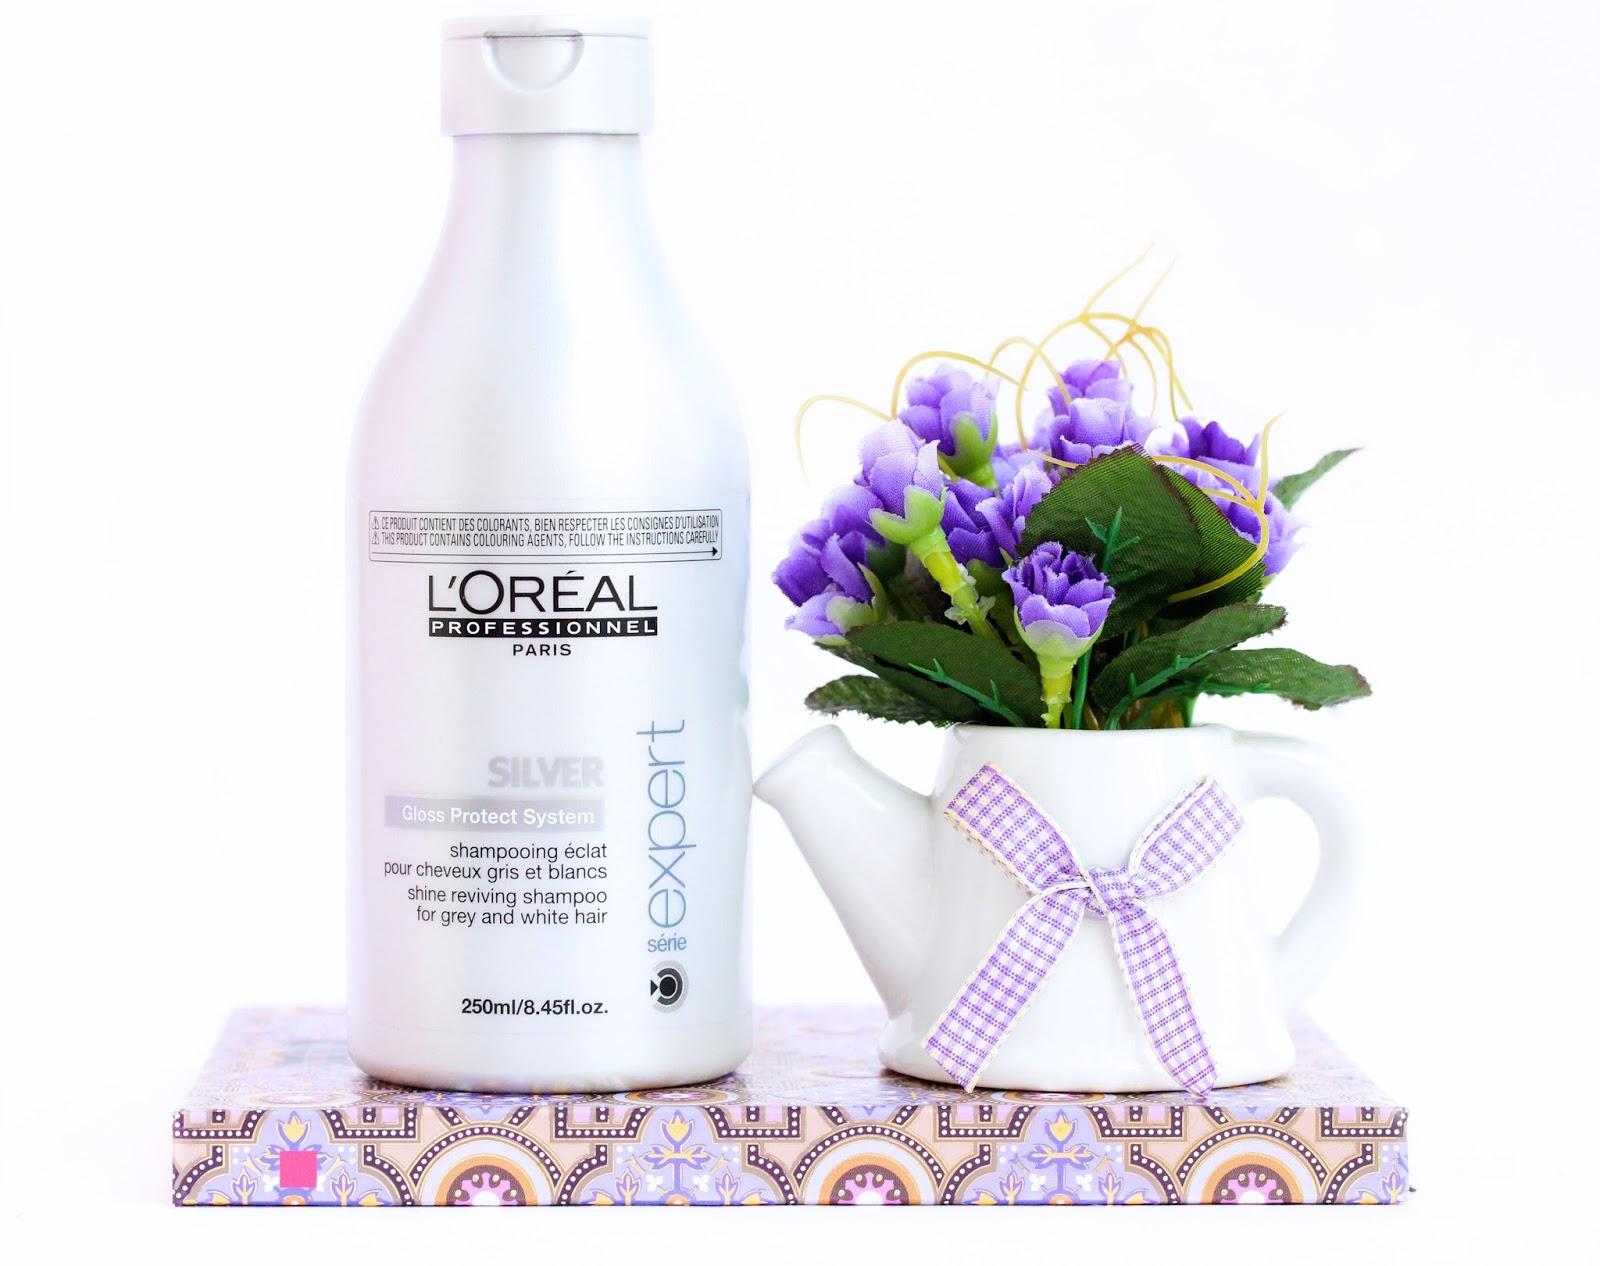 L'Oreal Silver Shampoo